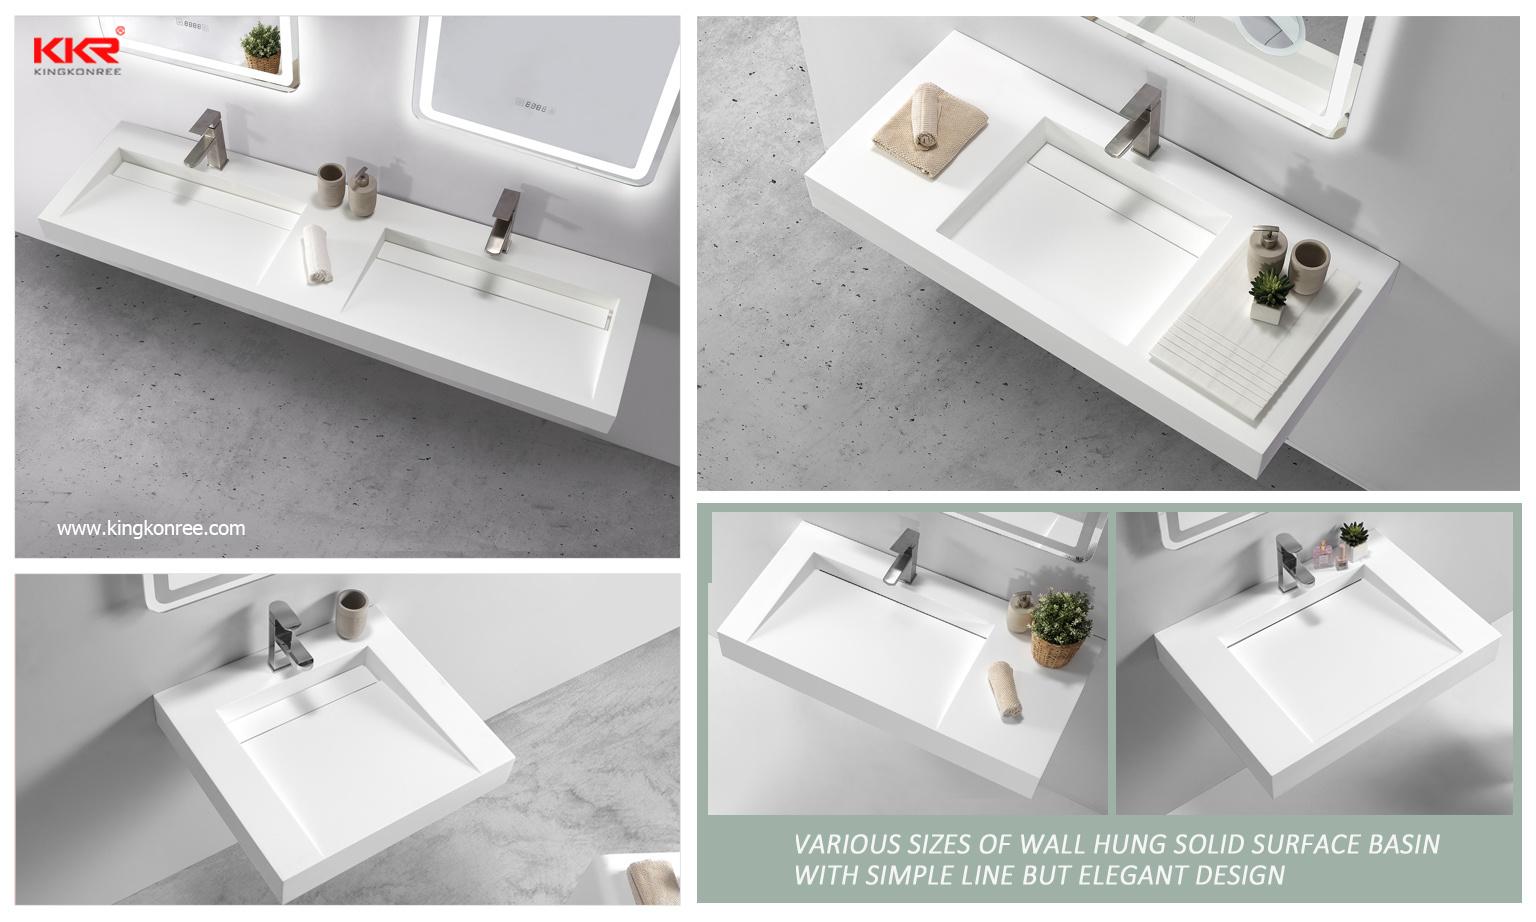 Artificial Stone Bathroom Sink Vanity Modern Bathroom Sinks China Bathroom Sinks Modern Bathroom Sink Made In China Com